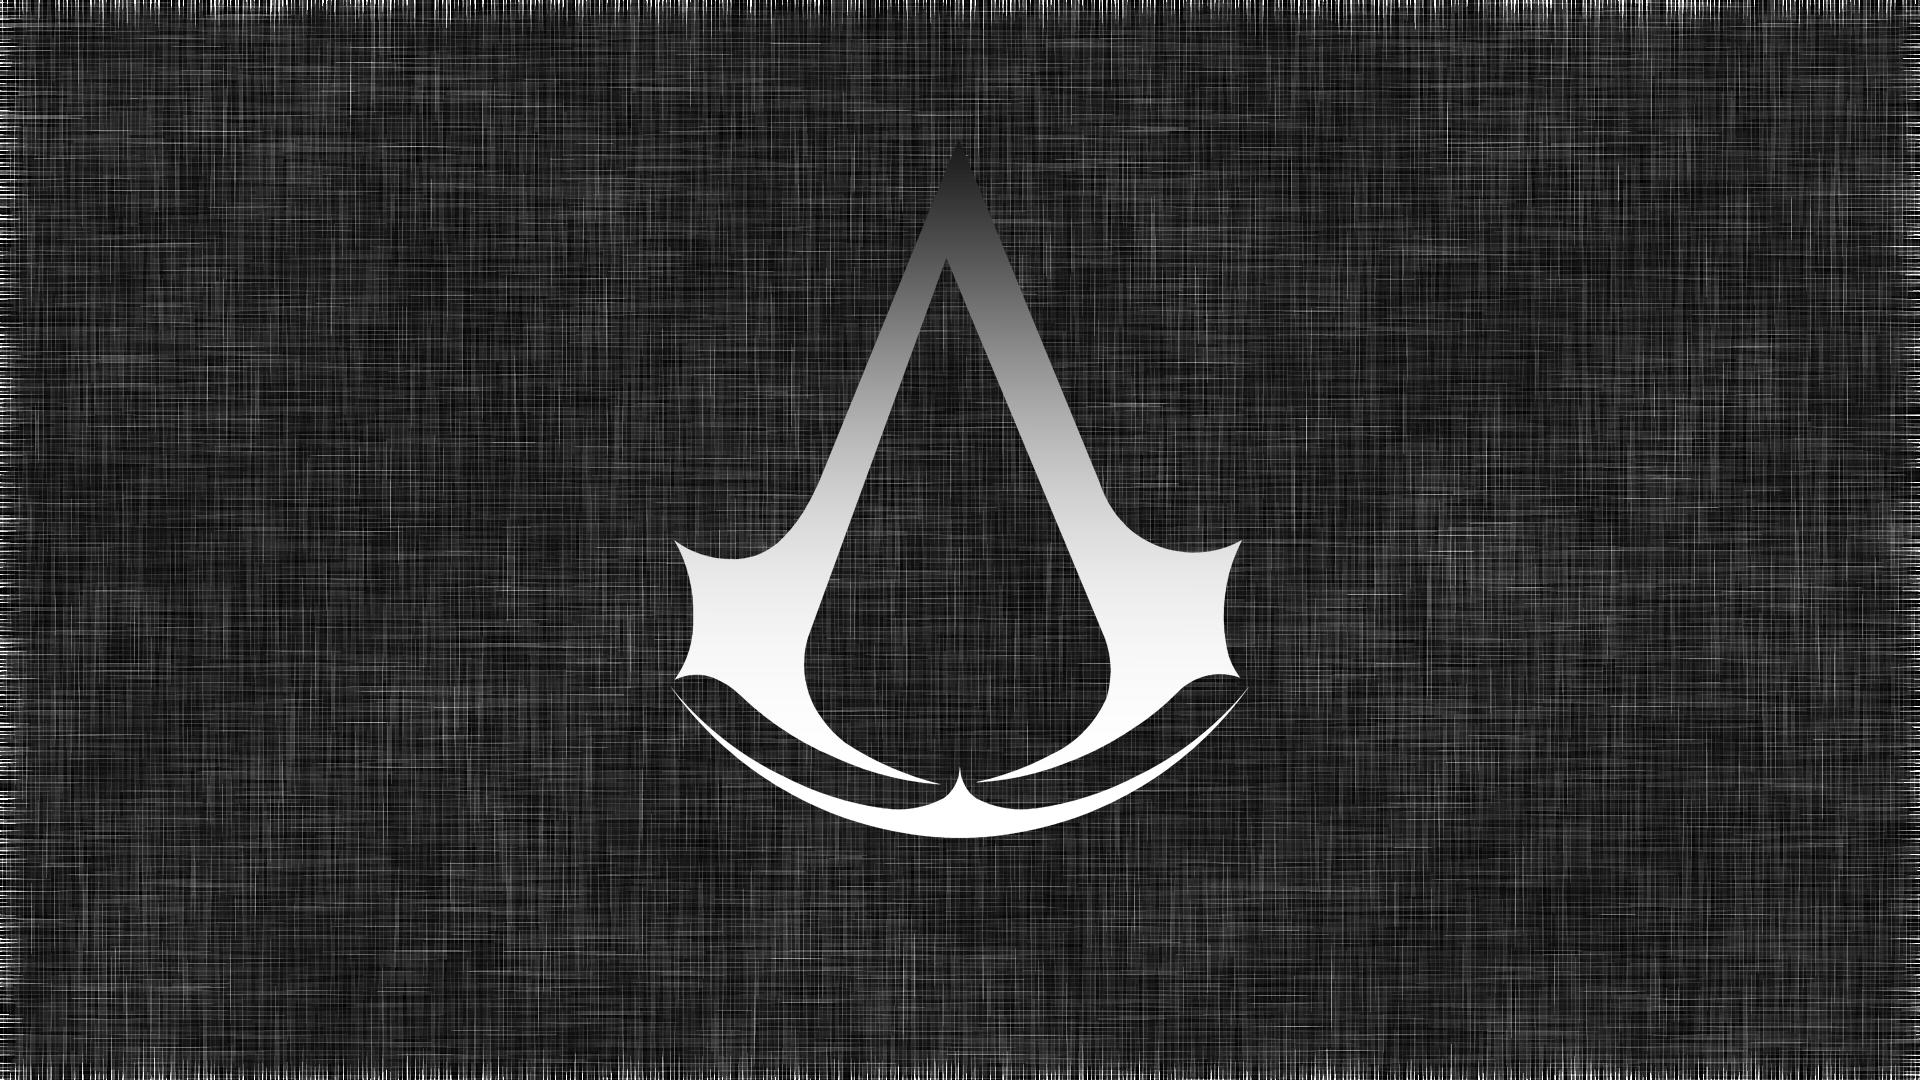 Assassin's Creed Wallpaper HD 1080p